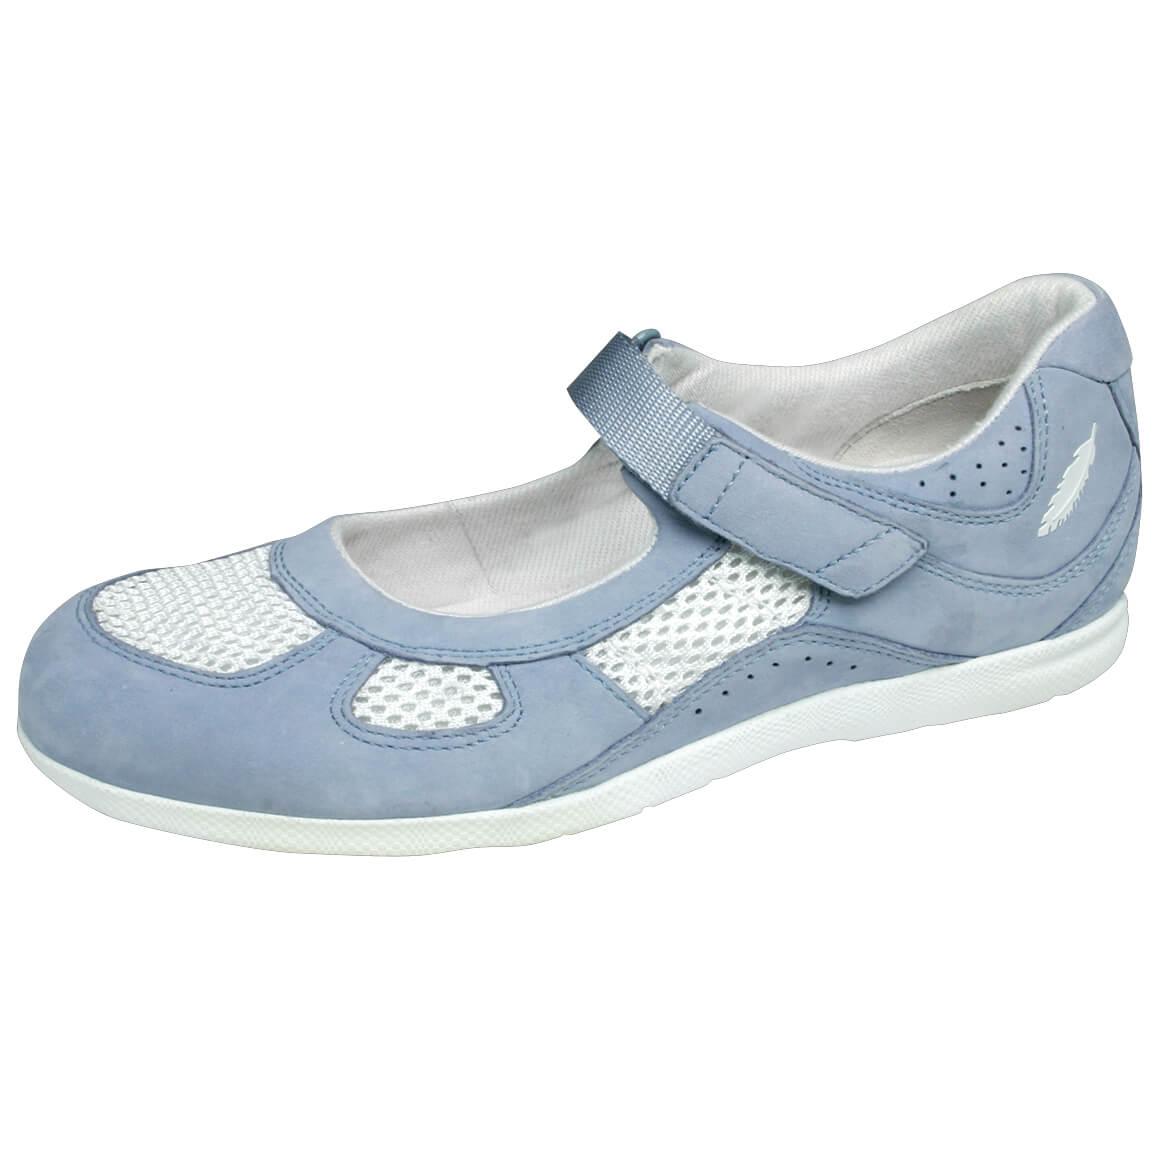 Drew® Delite Women's Mary Jane Shoe - RTV-363603